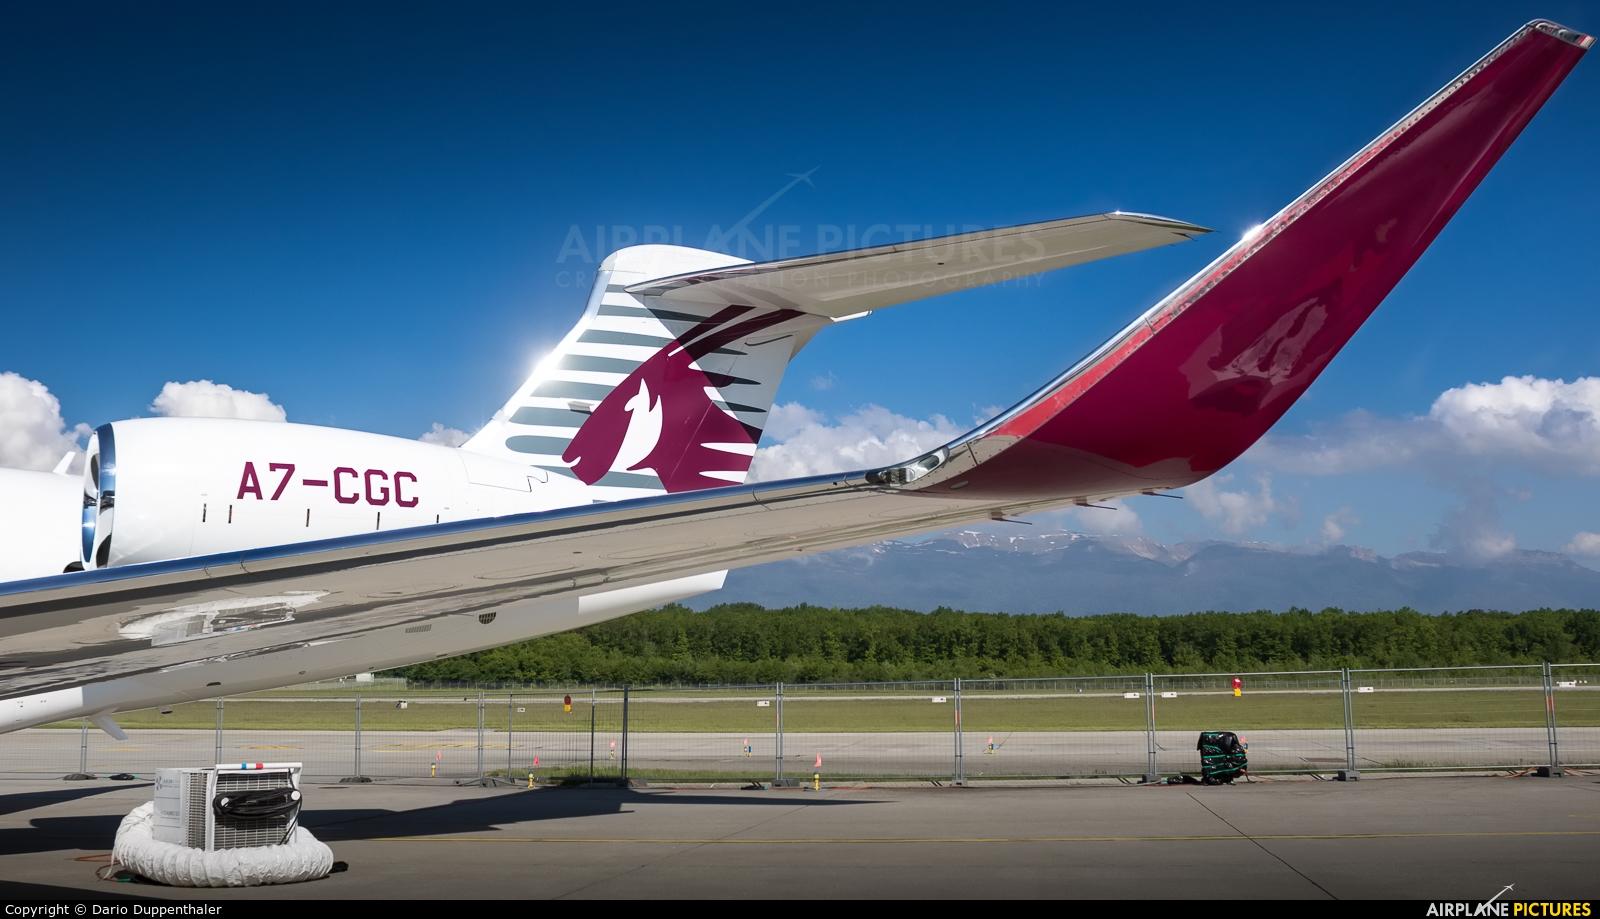 Qatar Executive A7-CGC aircraft at Geneva Intl